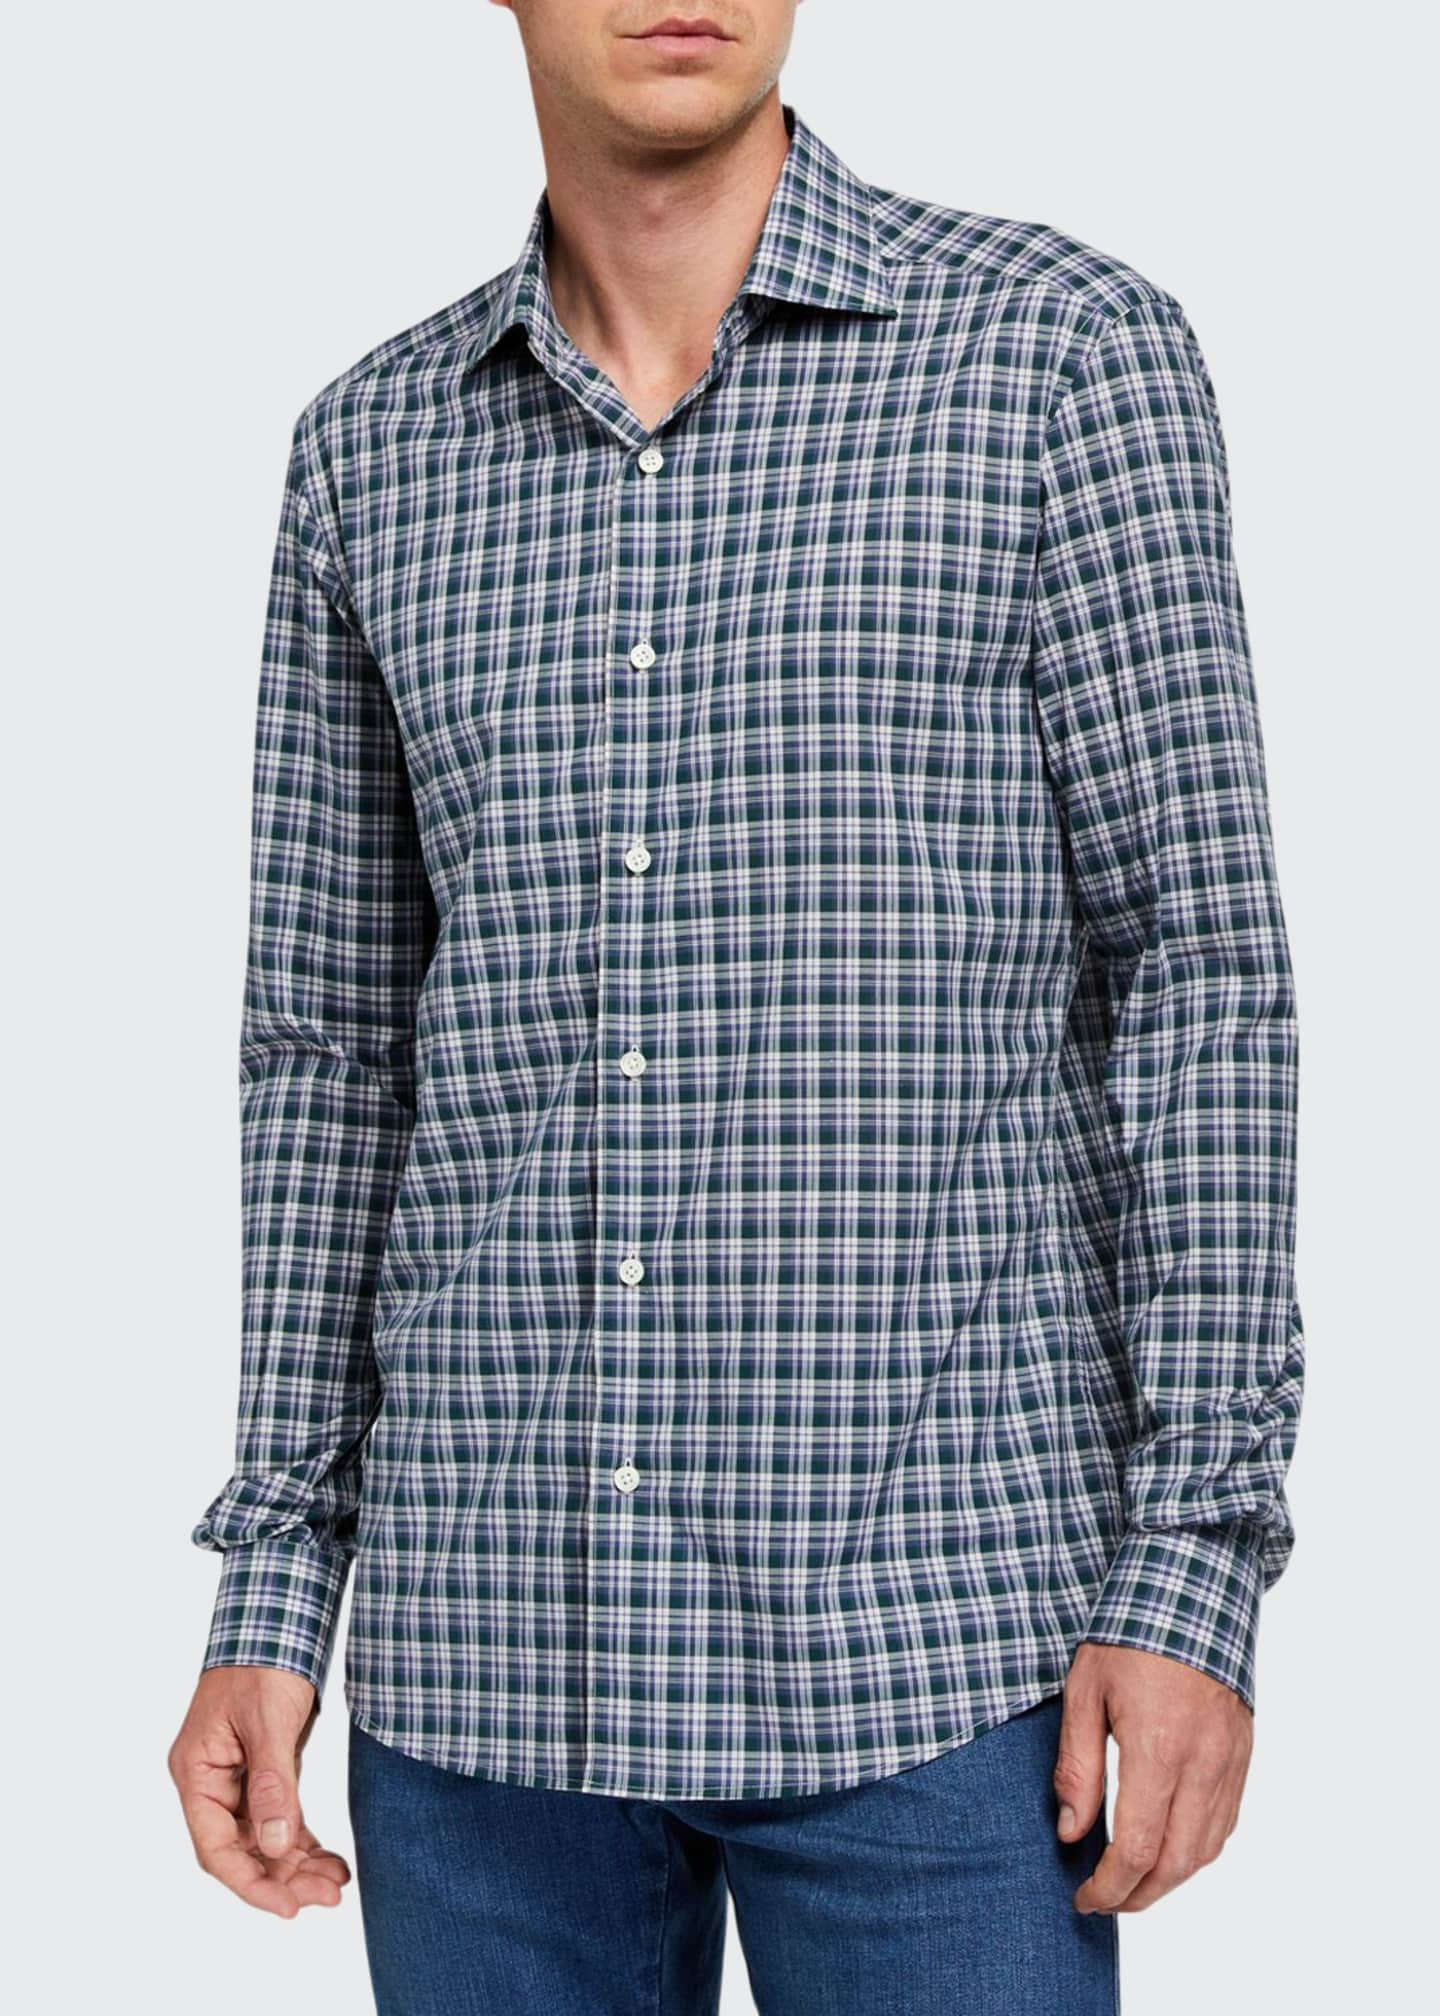 Ermenegildo Zegna Men's Two-Tone Plaid Sport Shirt, Blue/Green